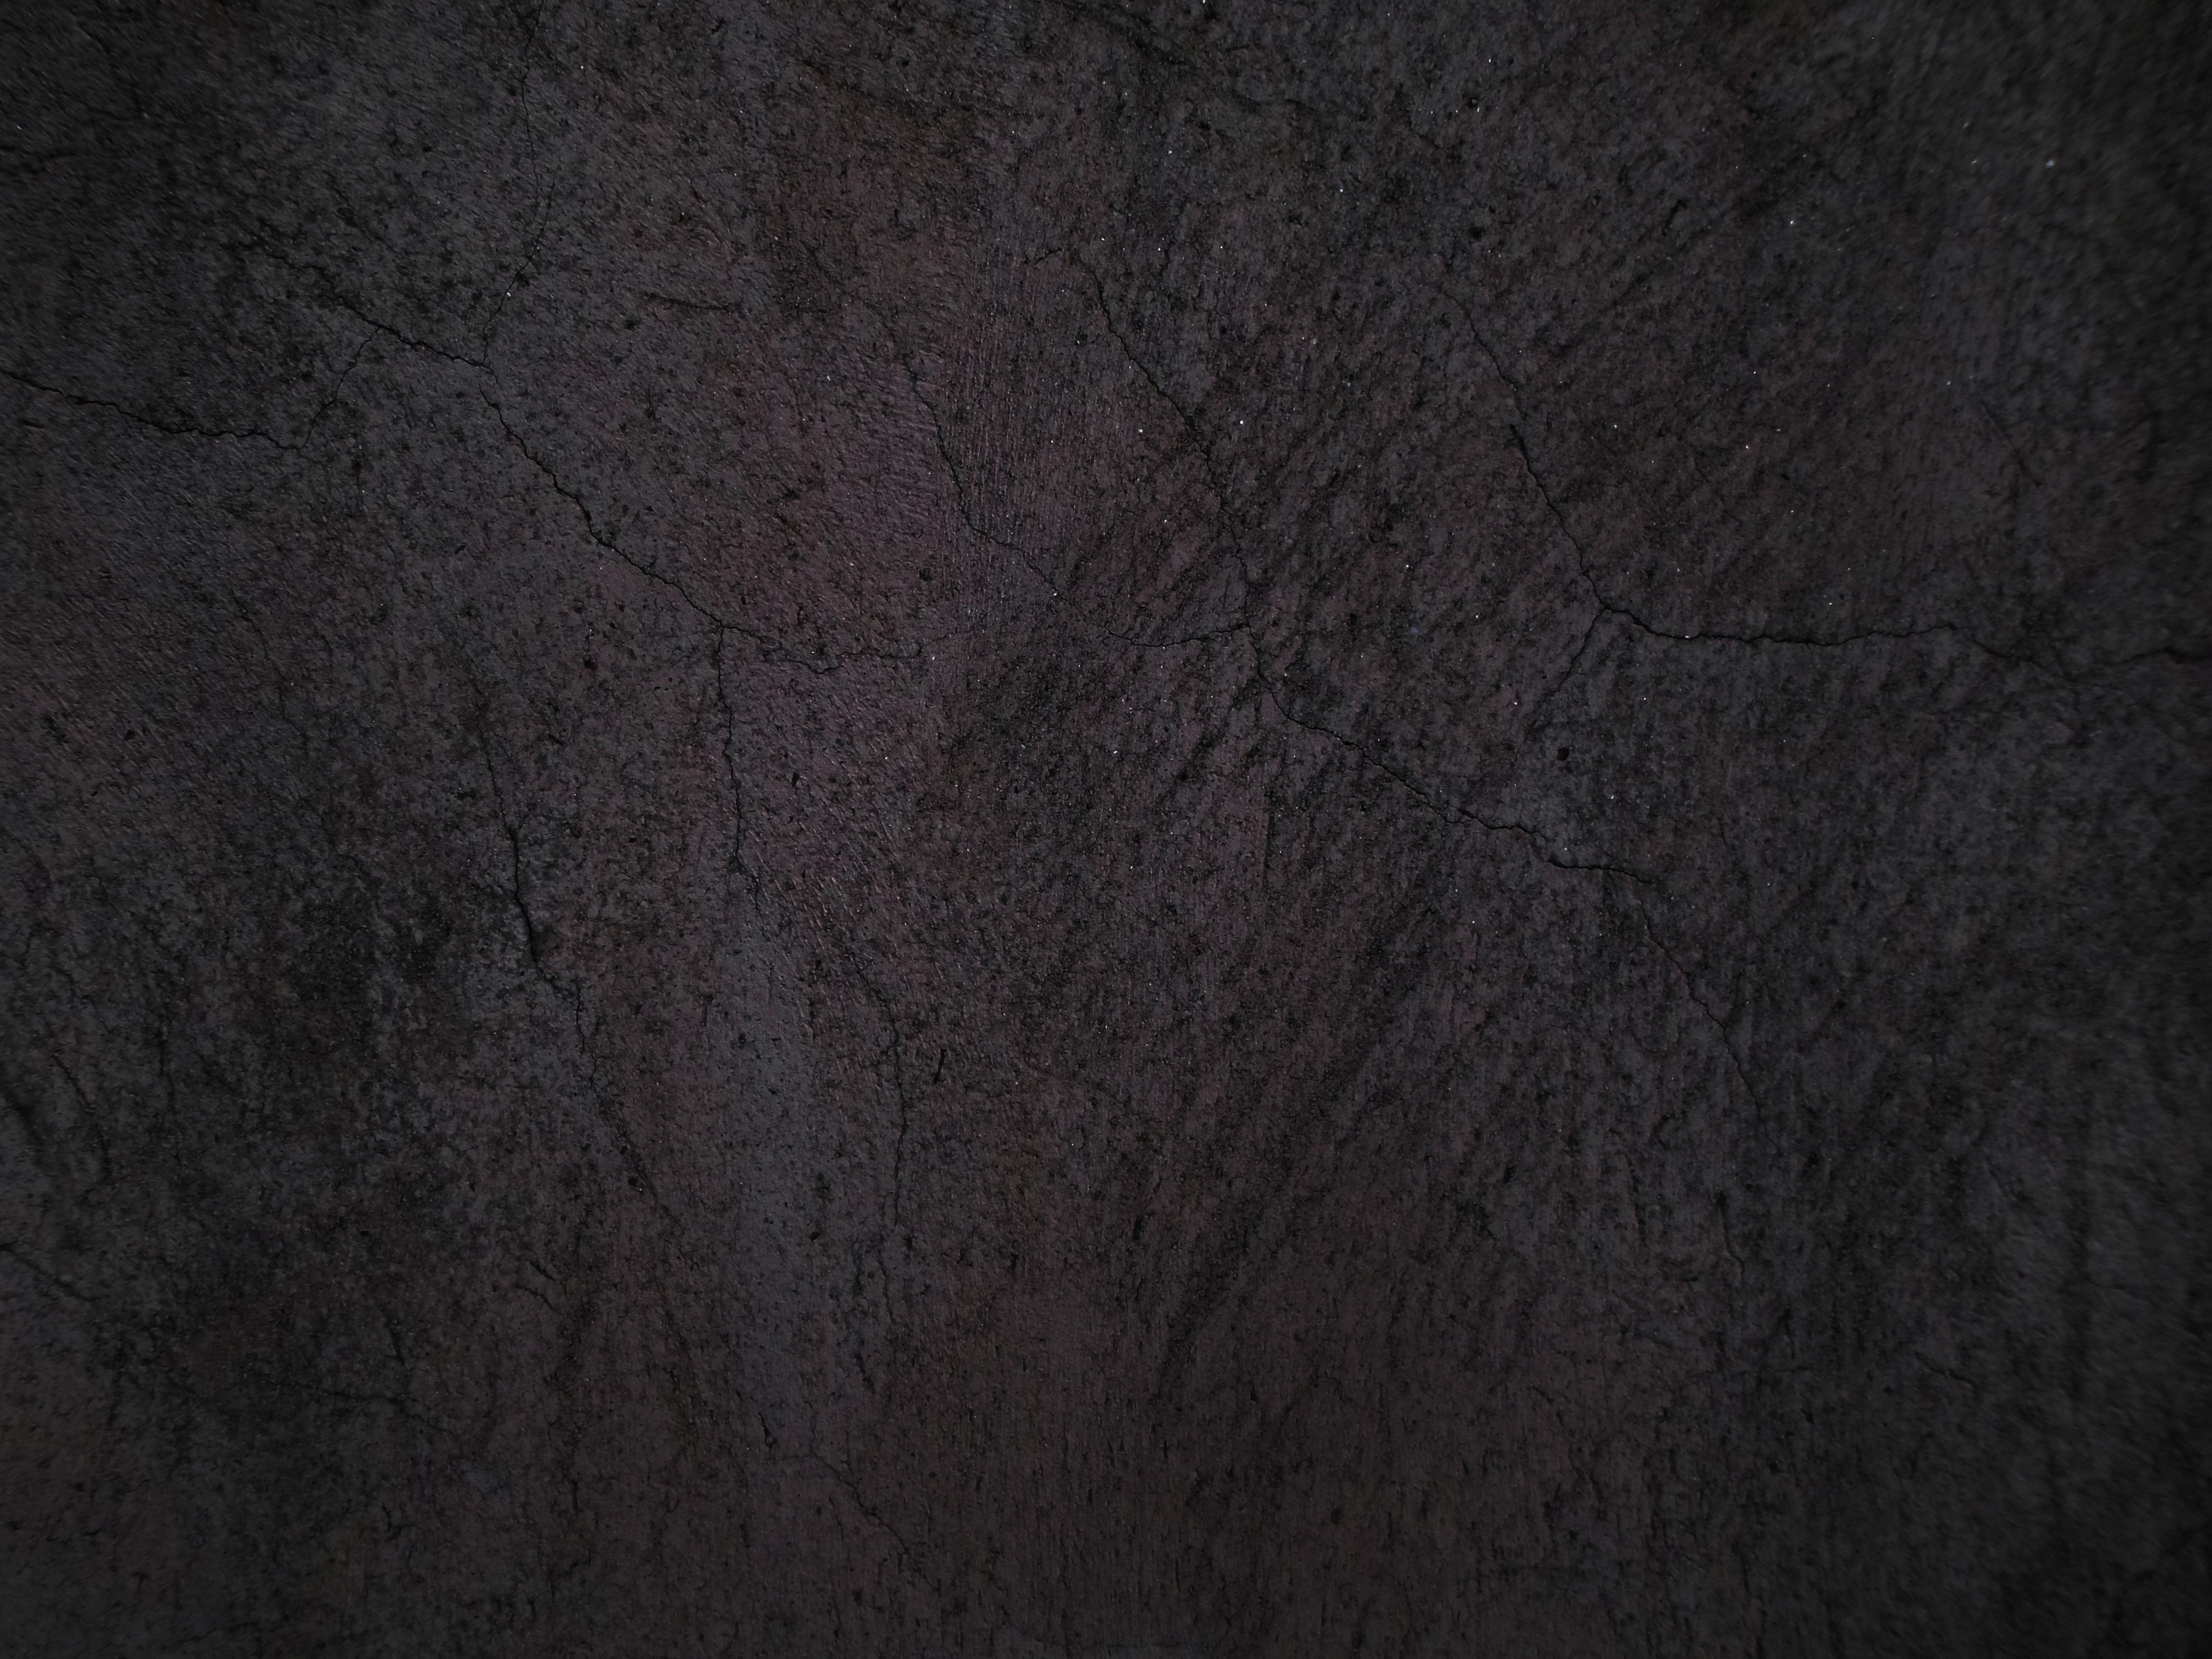 Free Images : texture, floor, brown, black, monochrome